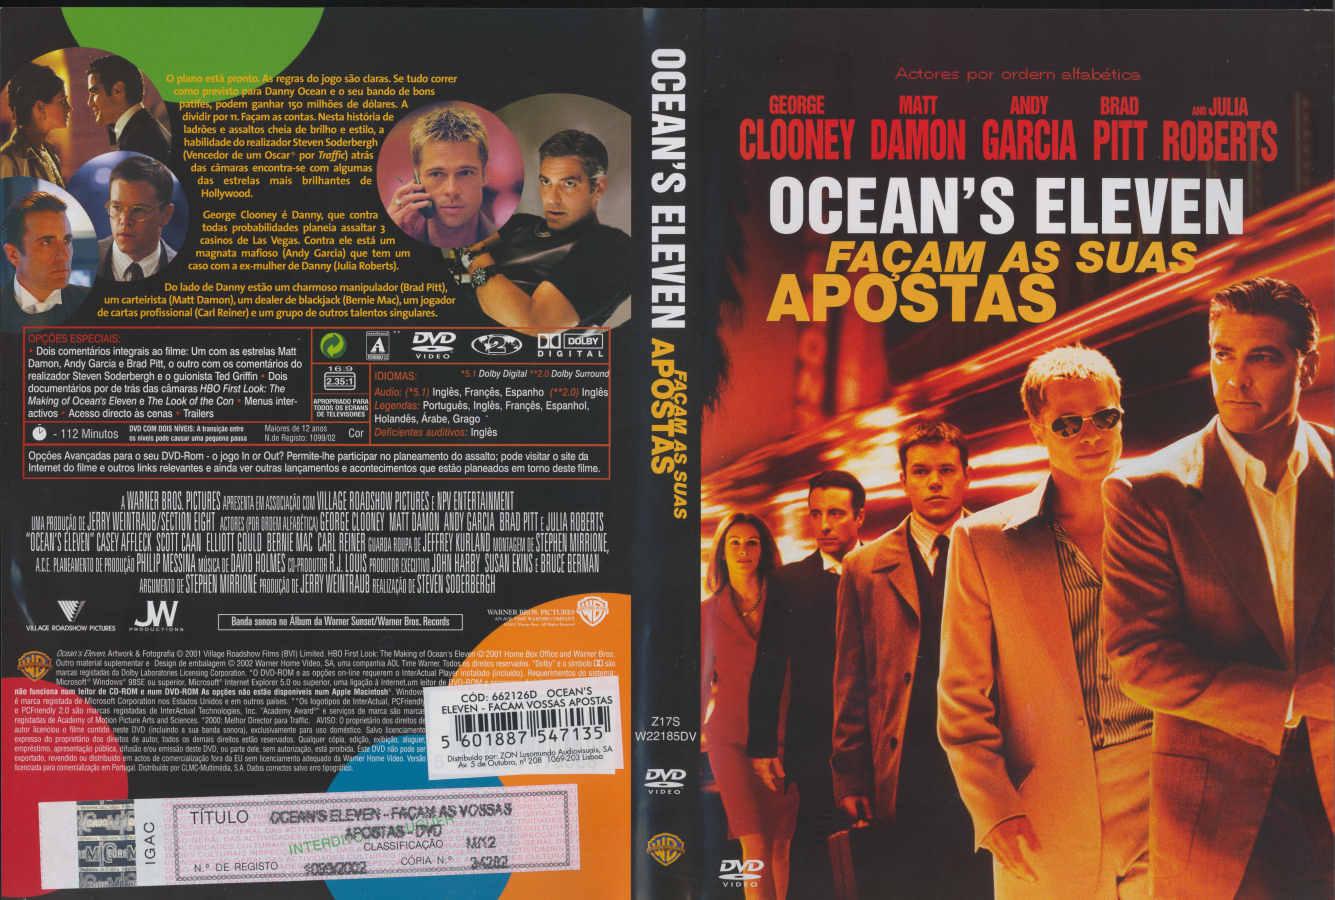 Oceans eleven – facam as vossas apostas andy garcia